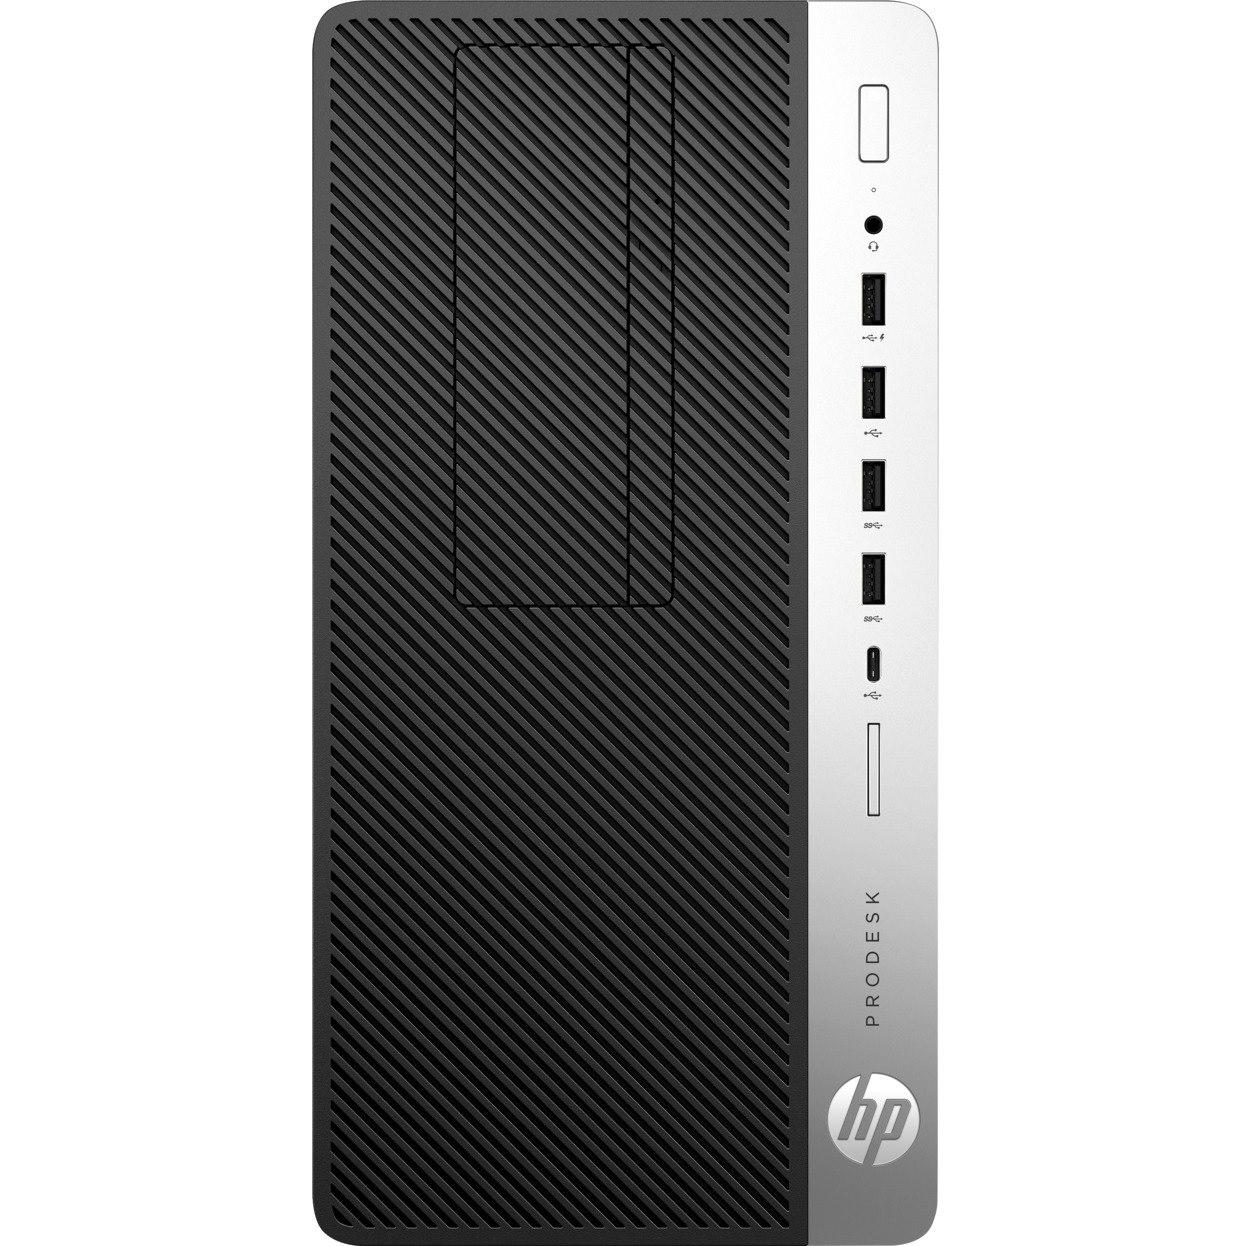 HP Business Desktop ProDesk 600 G3 Desktop Computer - Intel Core i7 (7th Gen) i7-7700 3.60 GHz - 8 GB DDR4 SDRAM - 256 GB SSD - Windows 10 Pro 64-bit - Micro Tower